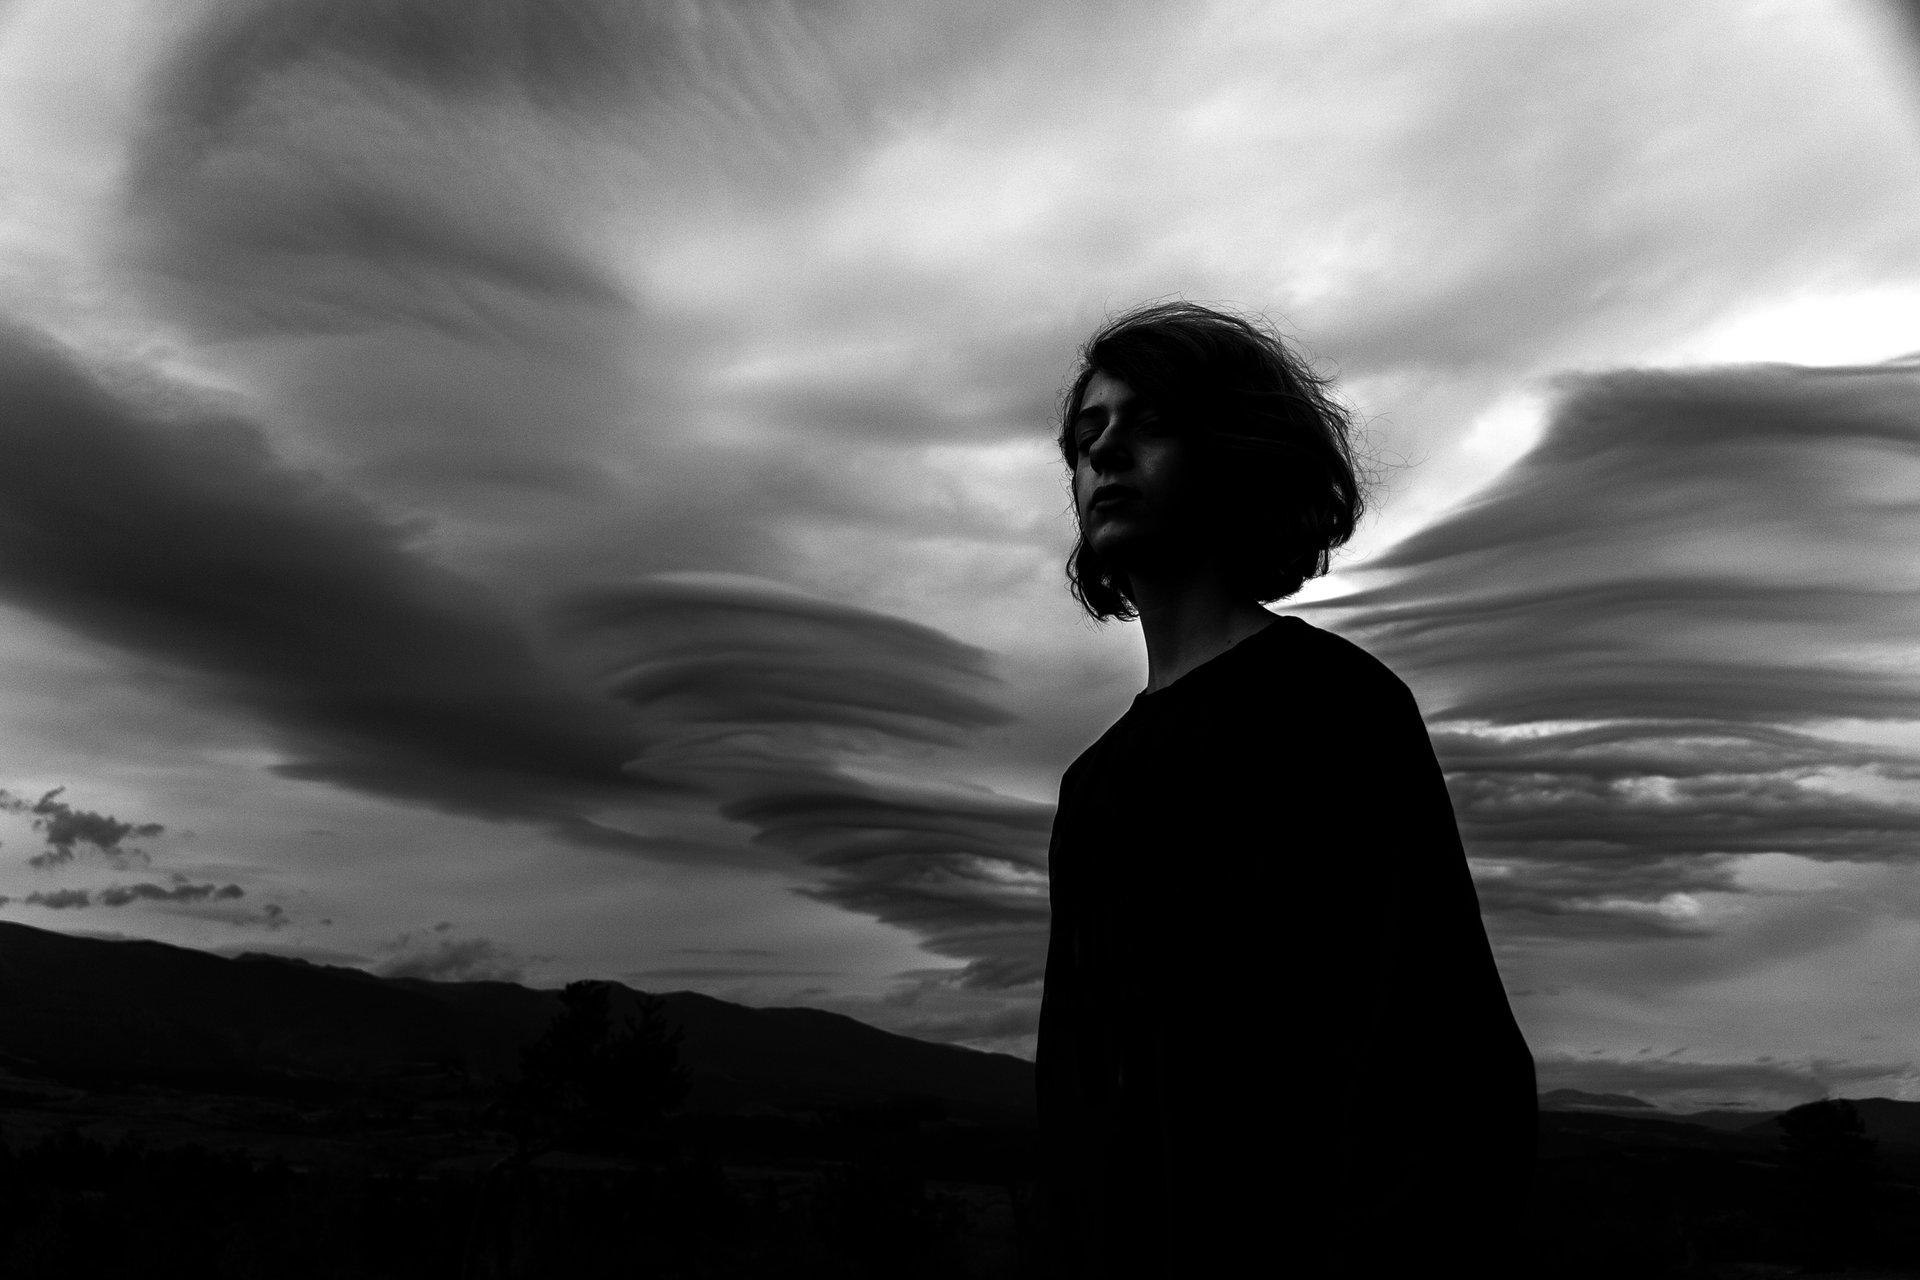 Photo in Abstract | Author Evko | PHOTO FORUM